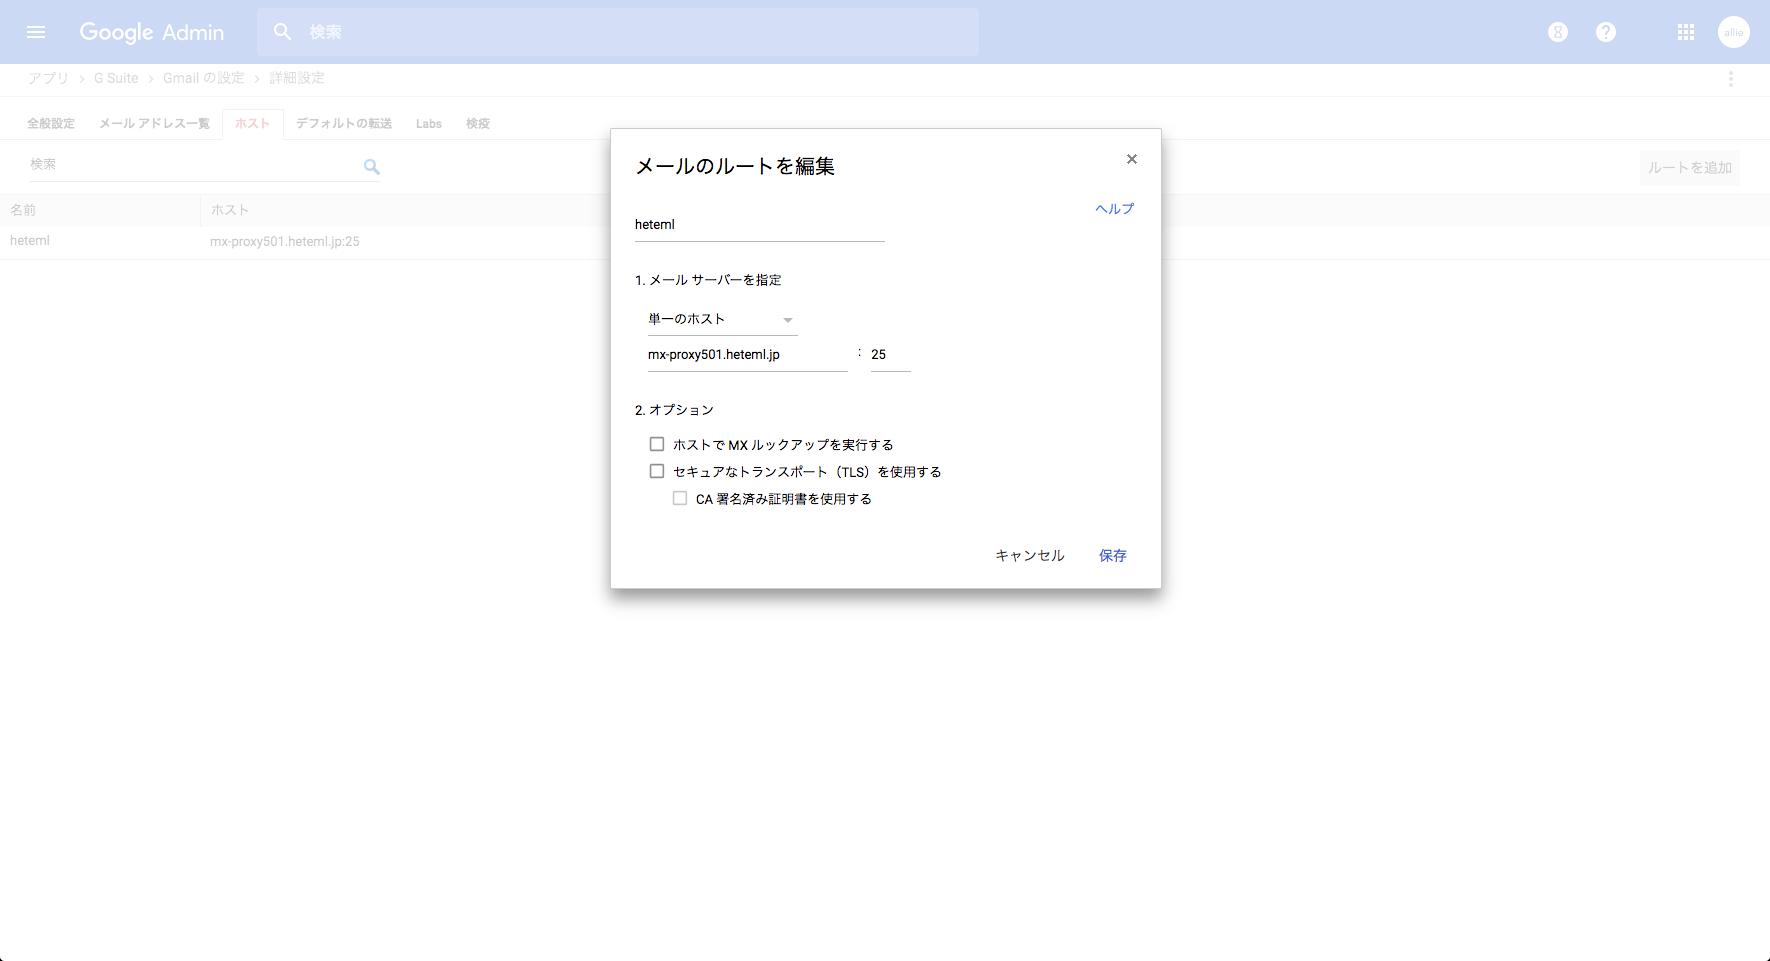 Google 管理コンソール -メールのルートを編集